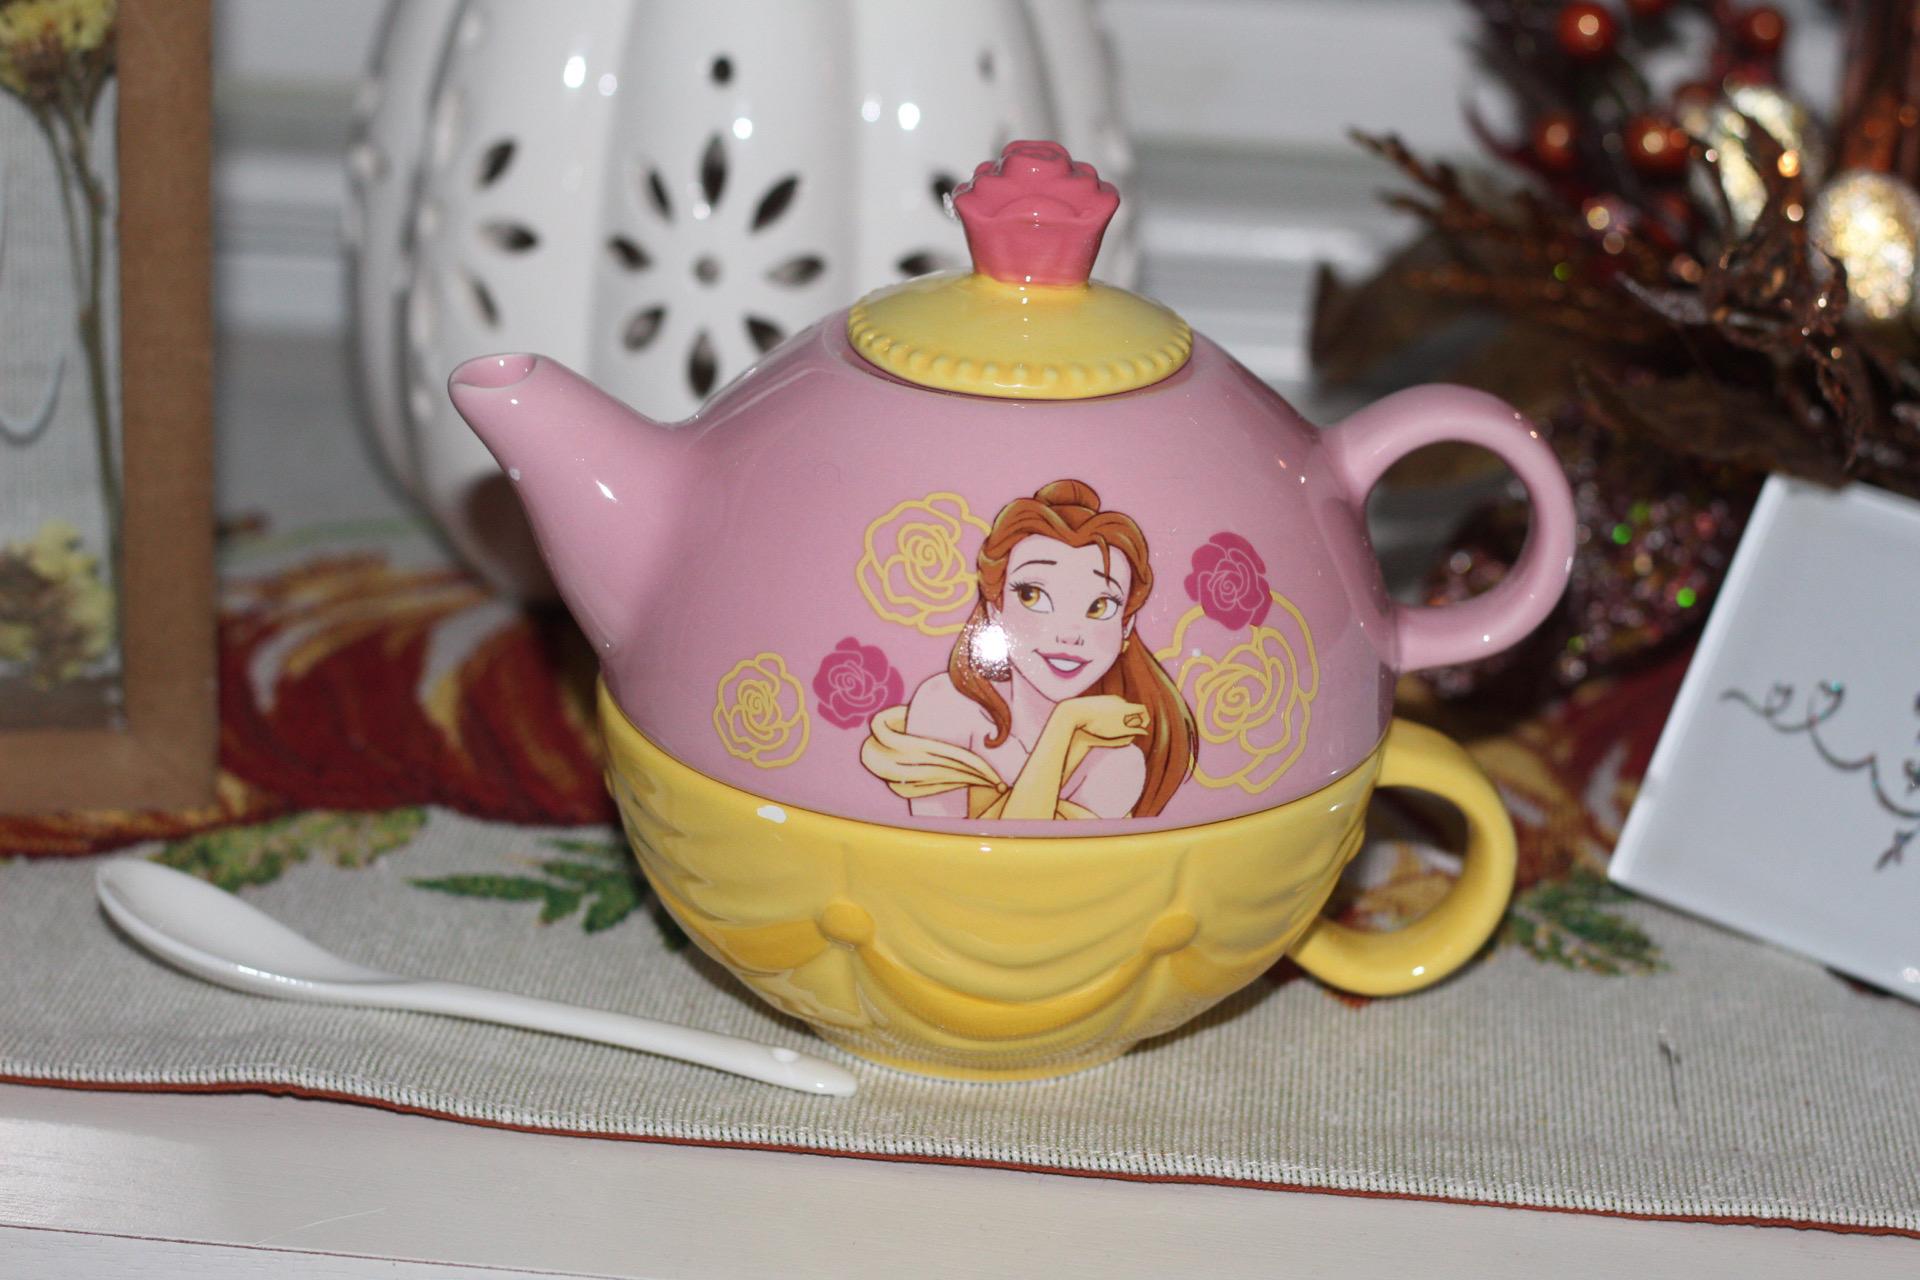 Gift Ideas for Disney Fans from Zak